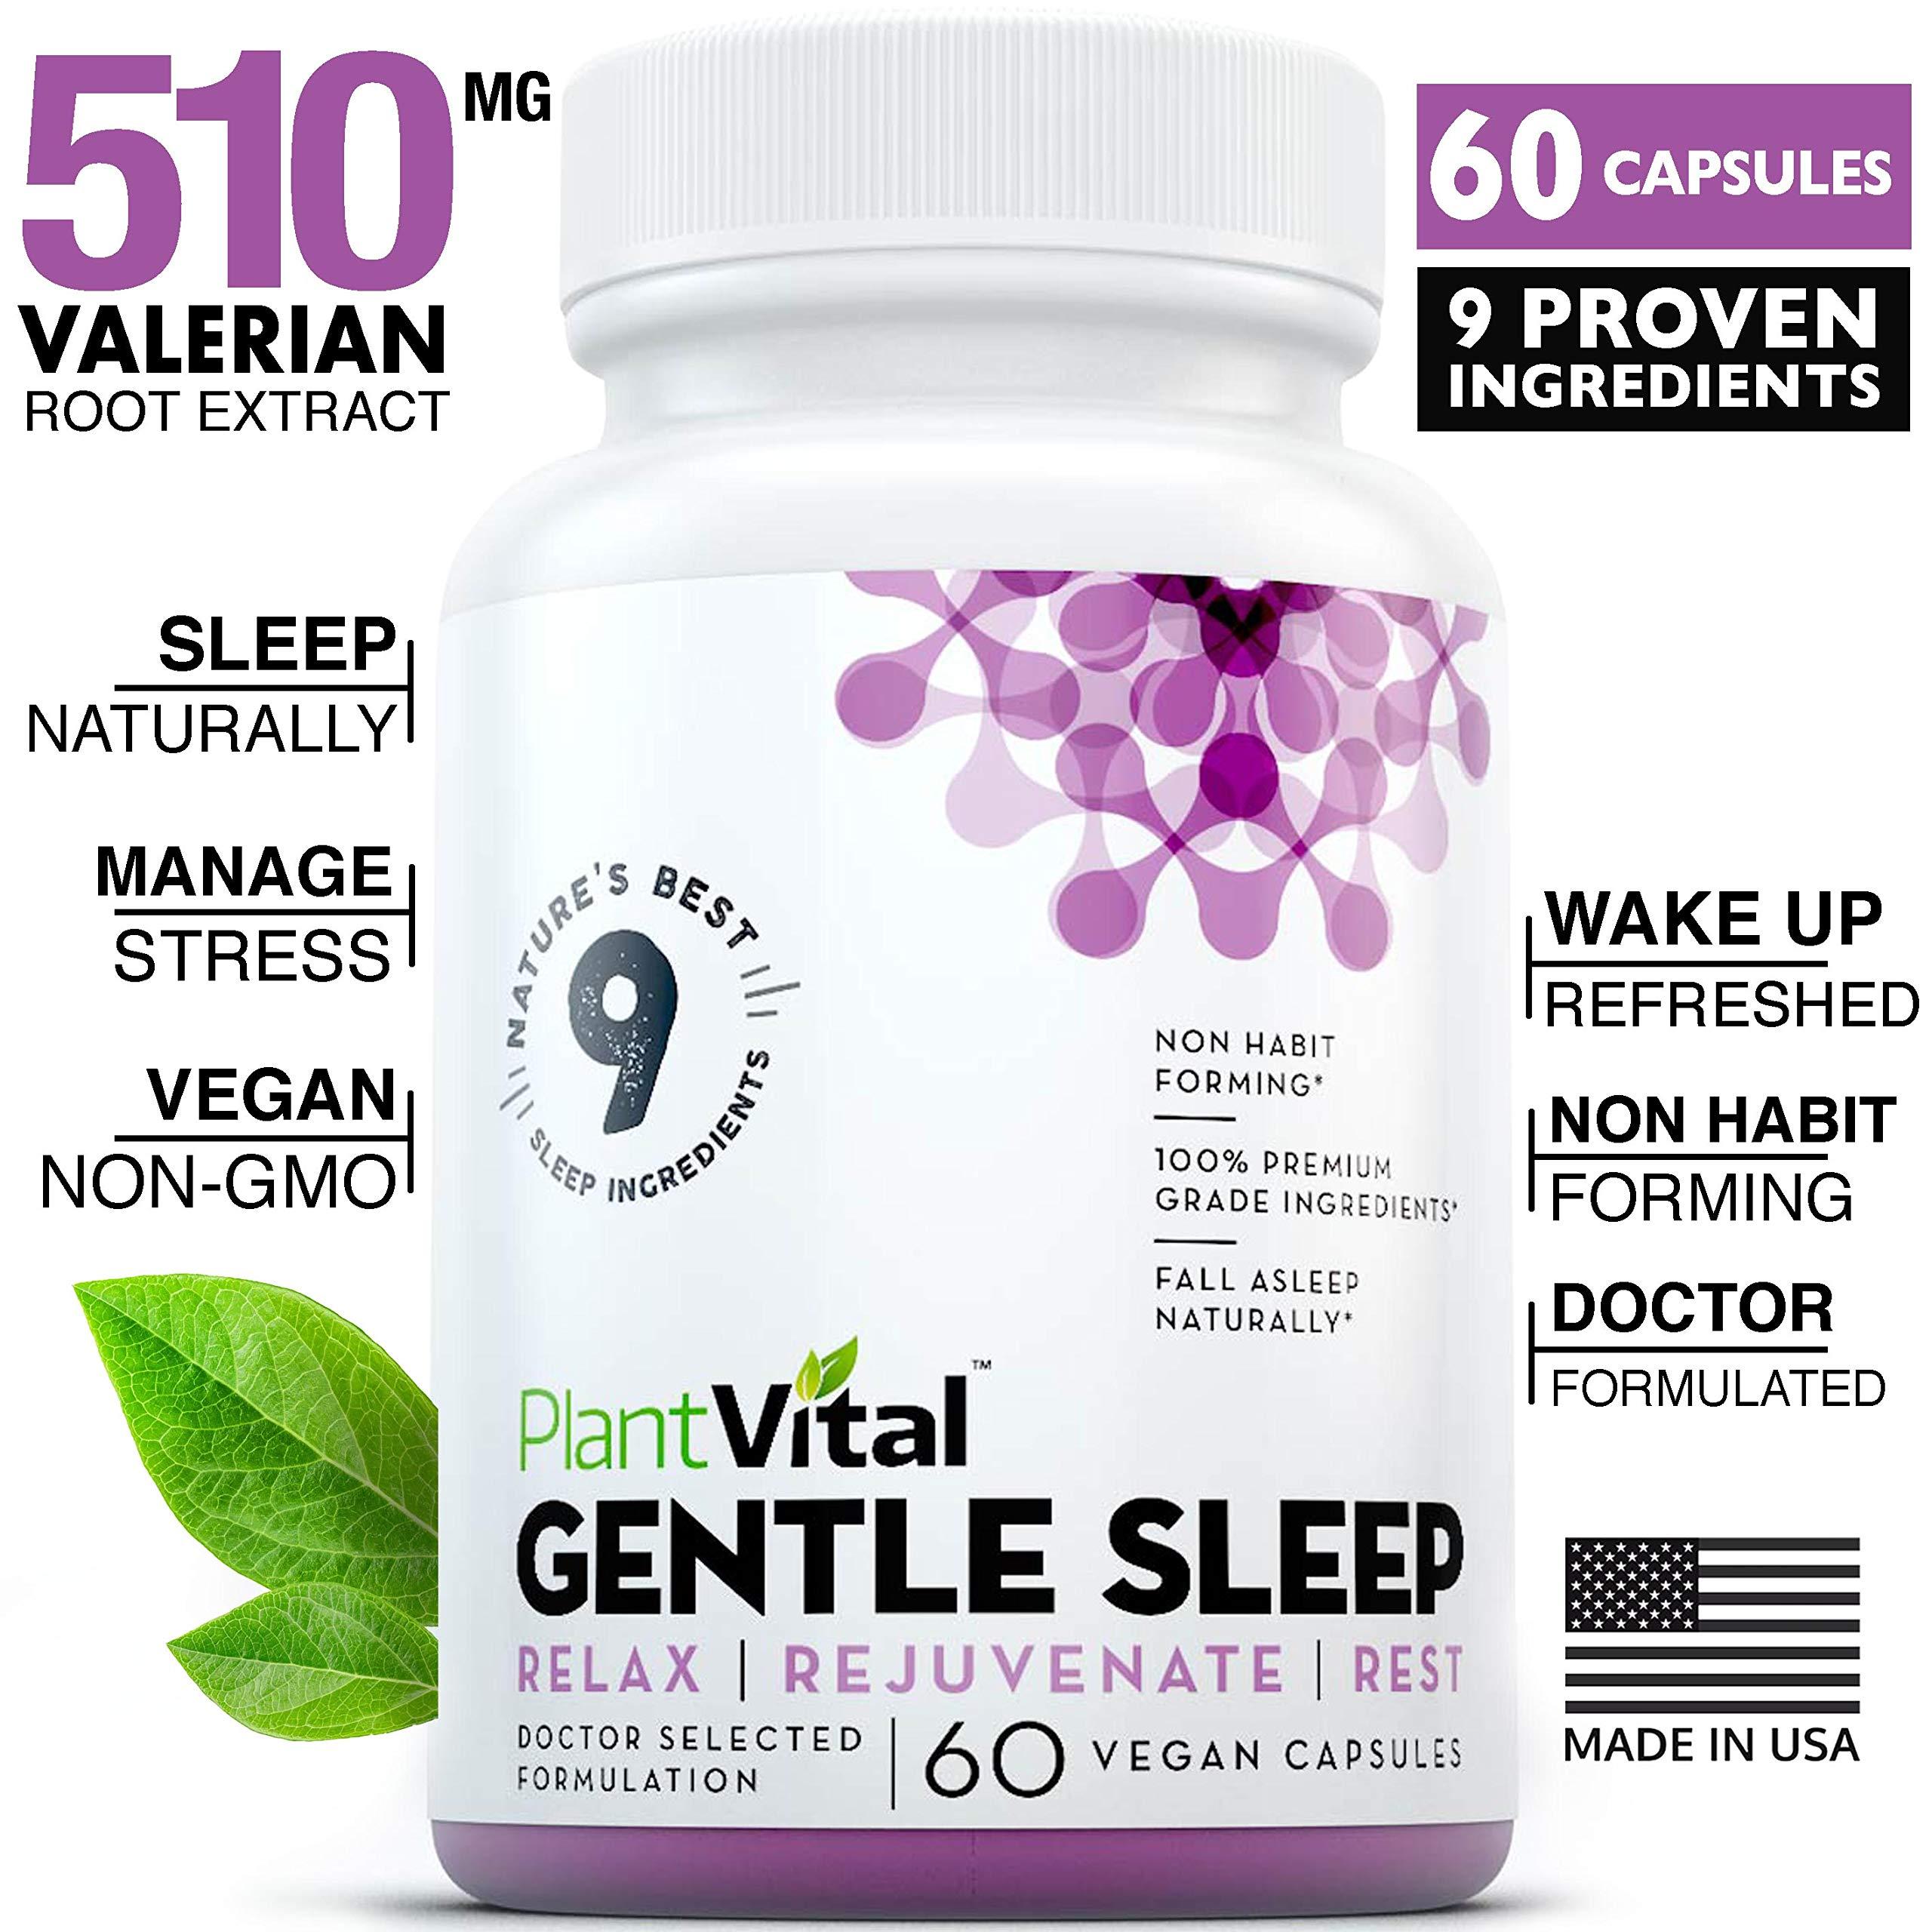 NEW! Sleeping Pills For Adults [EXTRA STRENGTH] Herbal Sleep Aid w Valerian Root, Melatonin, Chamomile, GABA, Lemon Balm. 60 All Natural Non-Habit Forming Vegan Capsules For Men & Women. Aids Insomnia